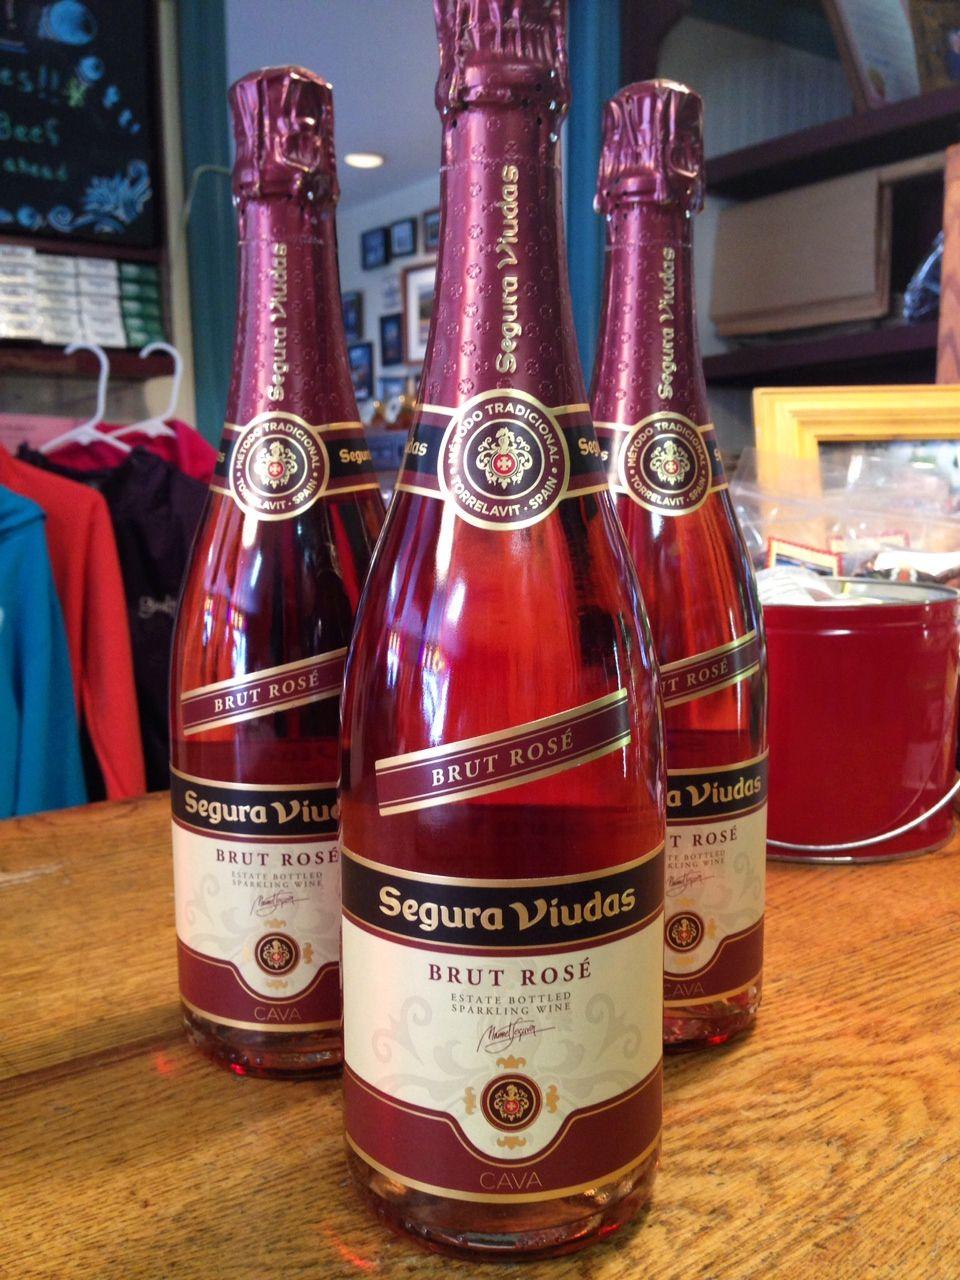 Segura Viudas Spanish Sparkling Brut Rose Wine Bottle Rose Wine Bottle Grocery Items